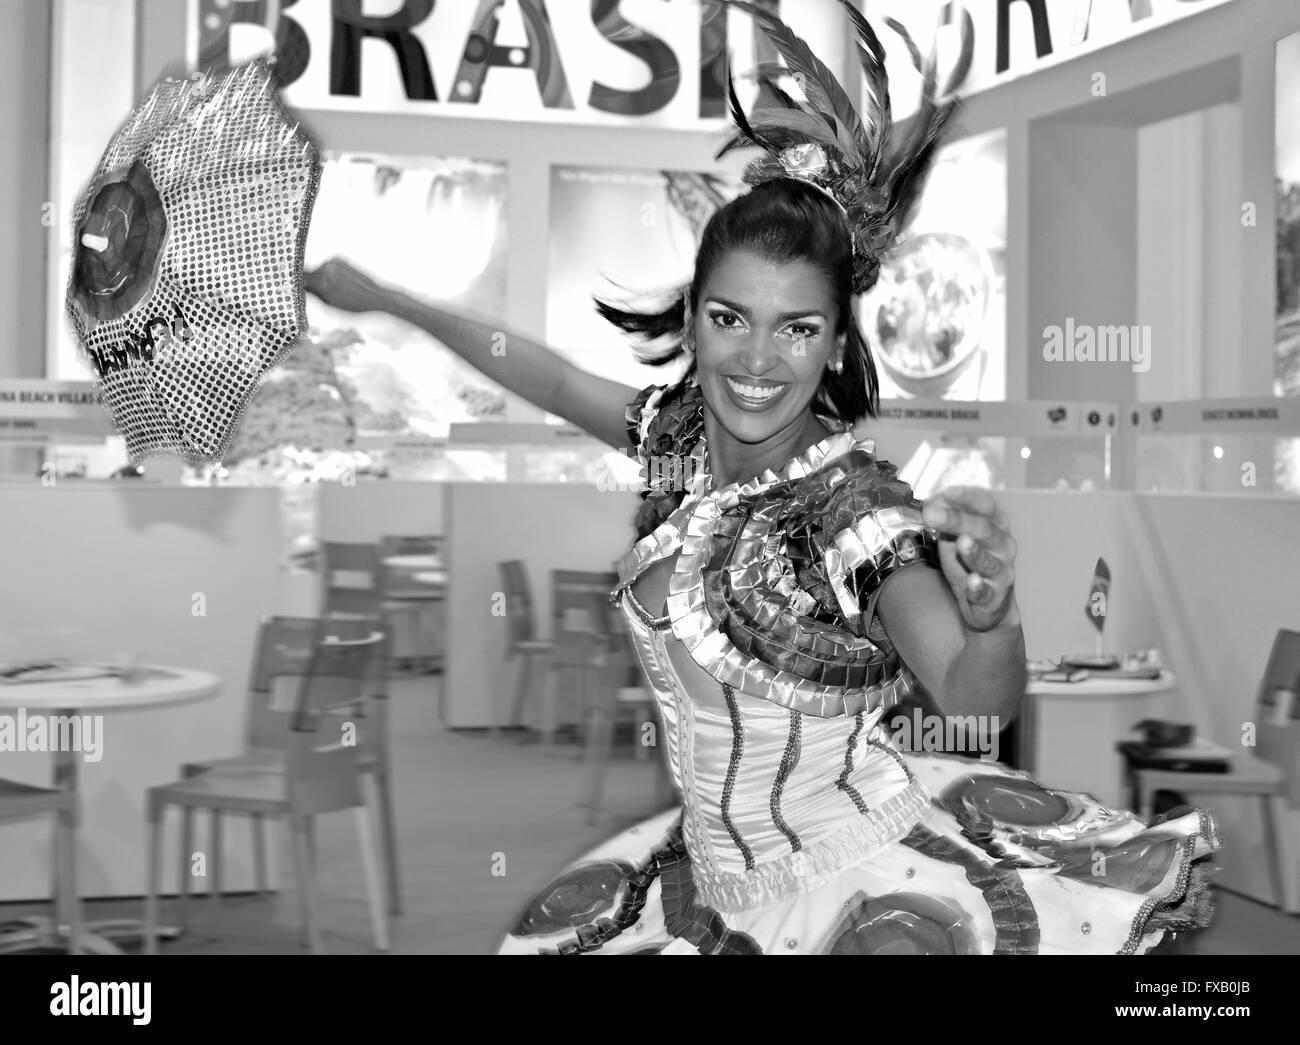 Brazilian  dancer performing traditional Pernambuco dance Frevo at Tourism Fair in Lisbon - Stock Image